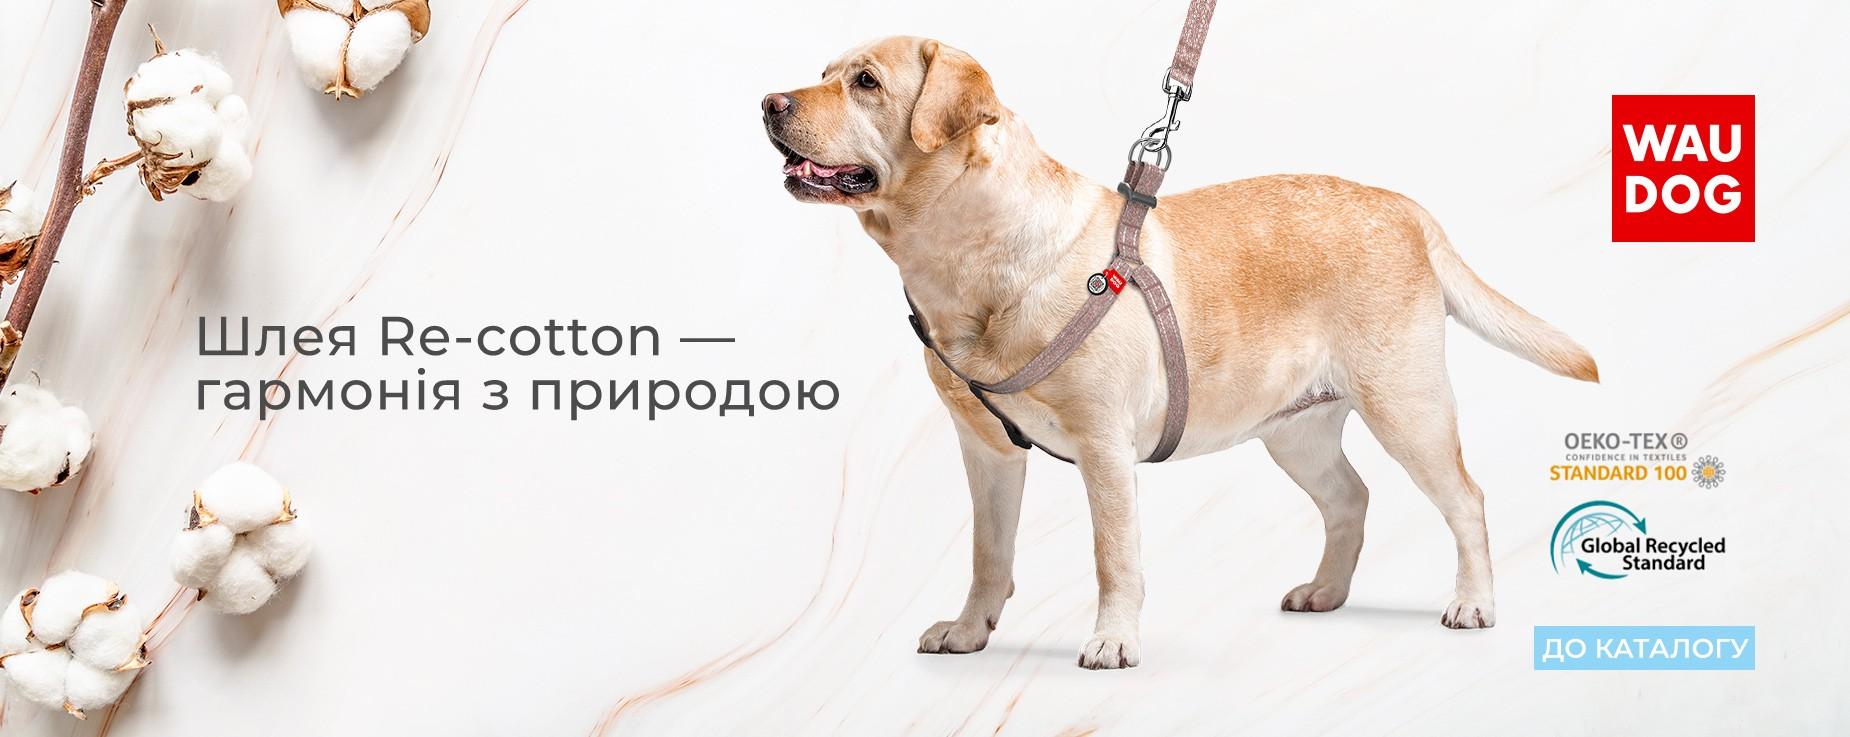 harness-recotton